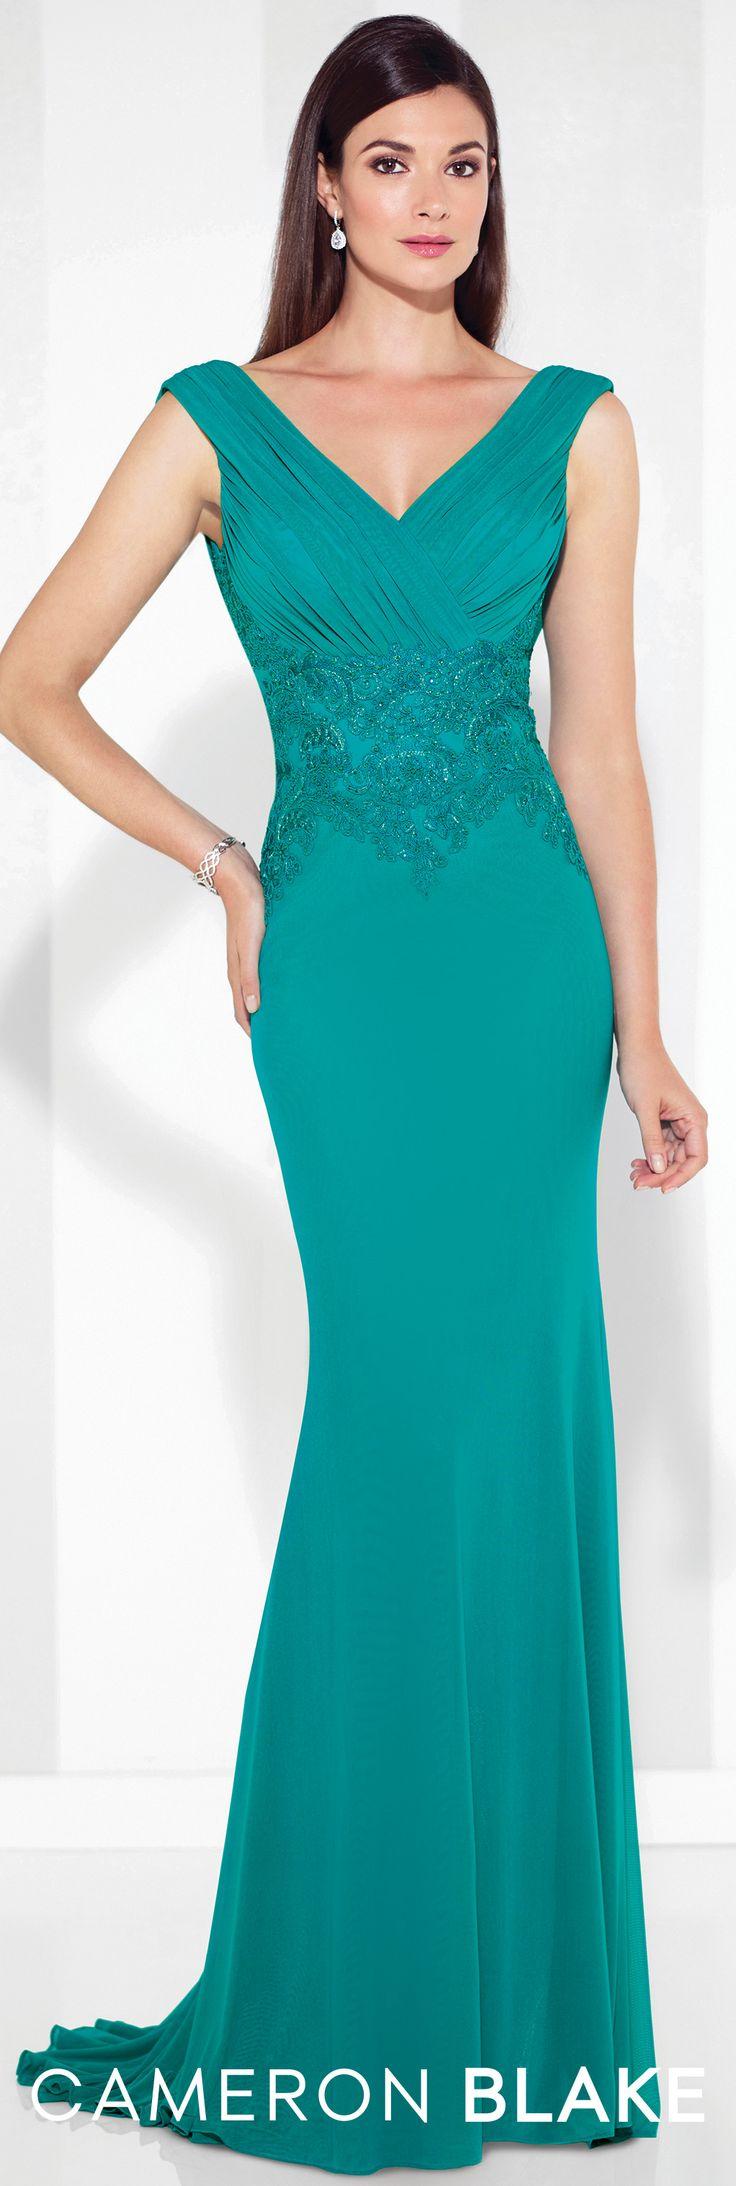 193 best Gowns Mon Cheri images on Pinterest   Formal evening ...